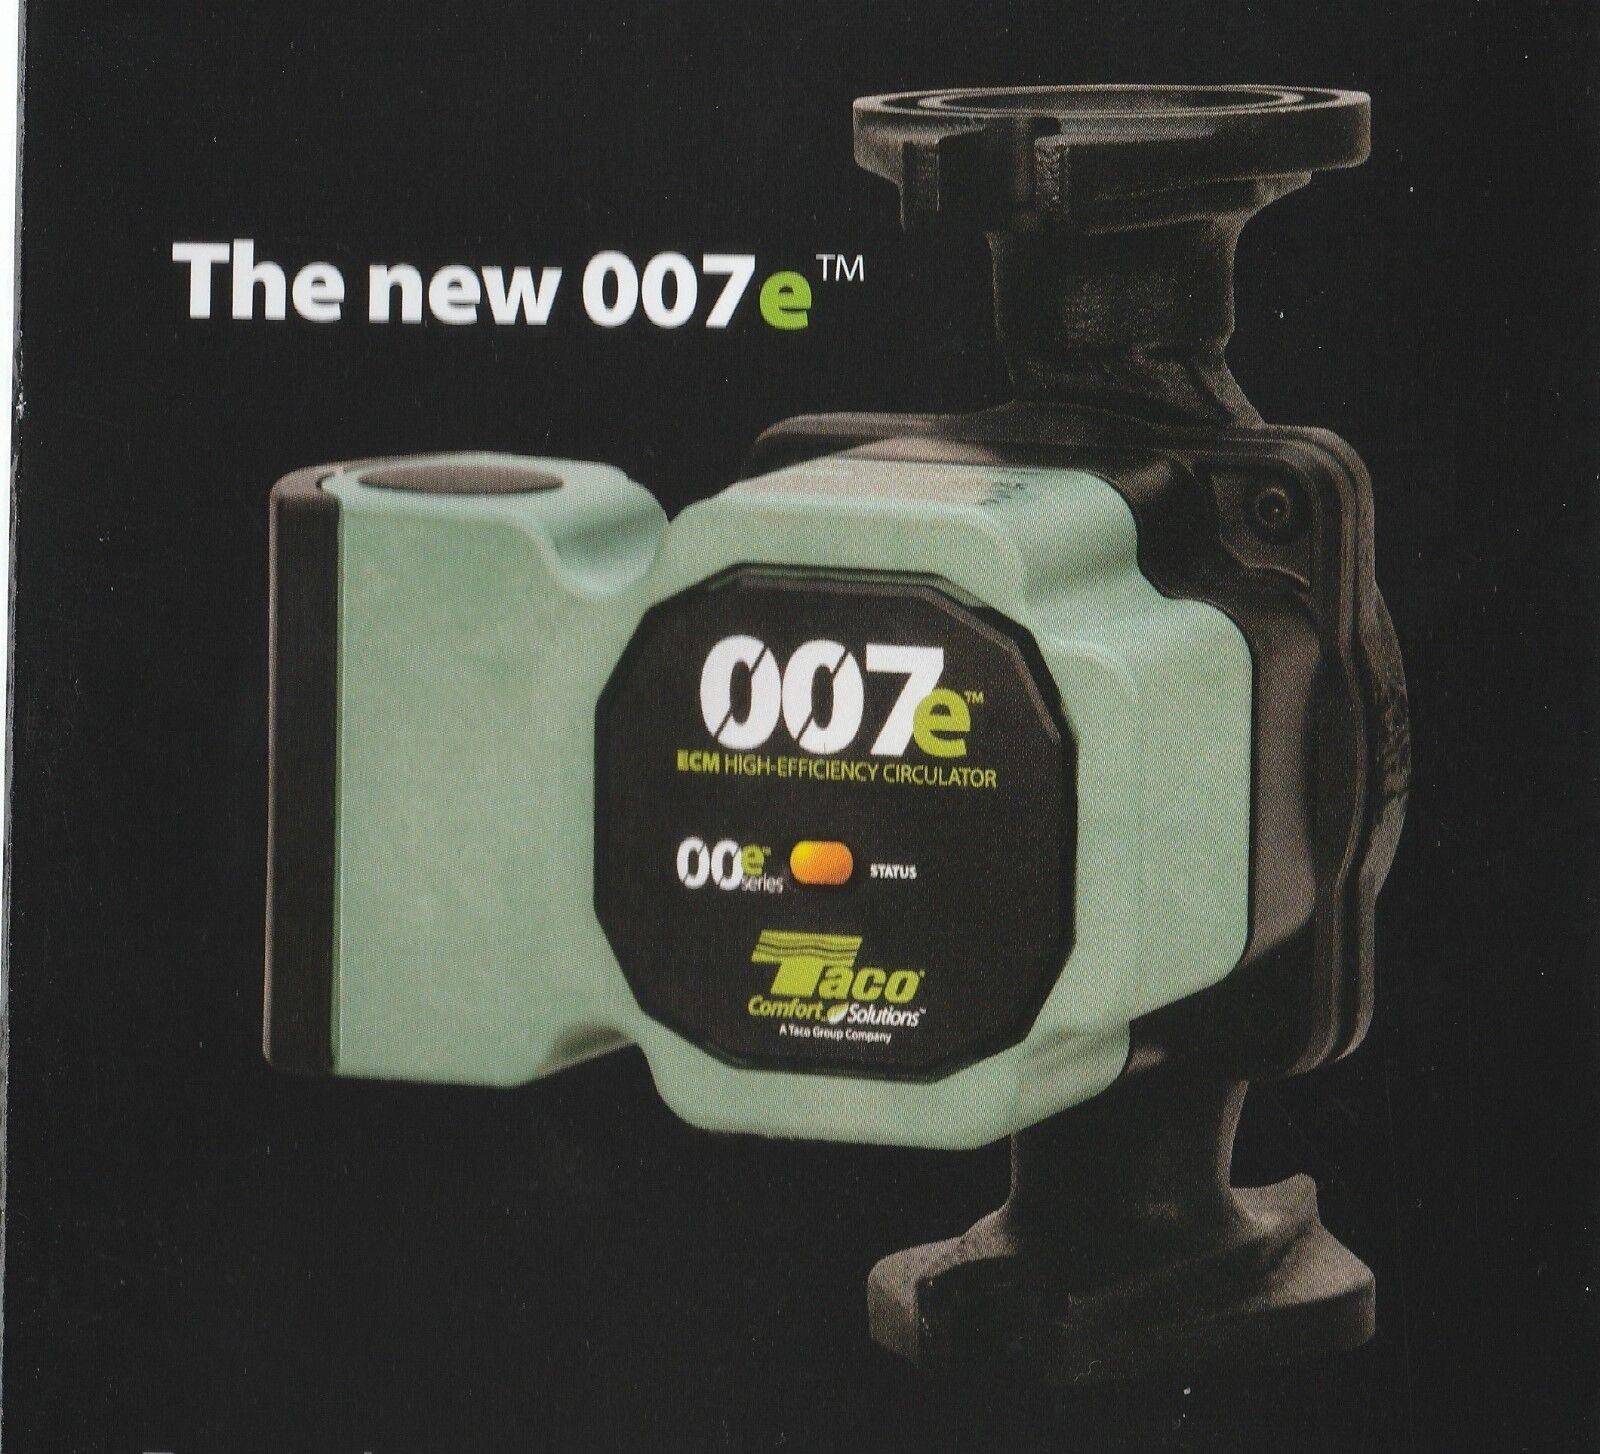 Taco Evolve 007e Ecm High Efficiency Circulator Pump Ebay Wiring 007 F4 Norton Secured Powered By Verisign